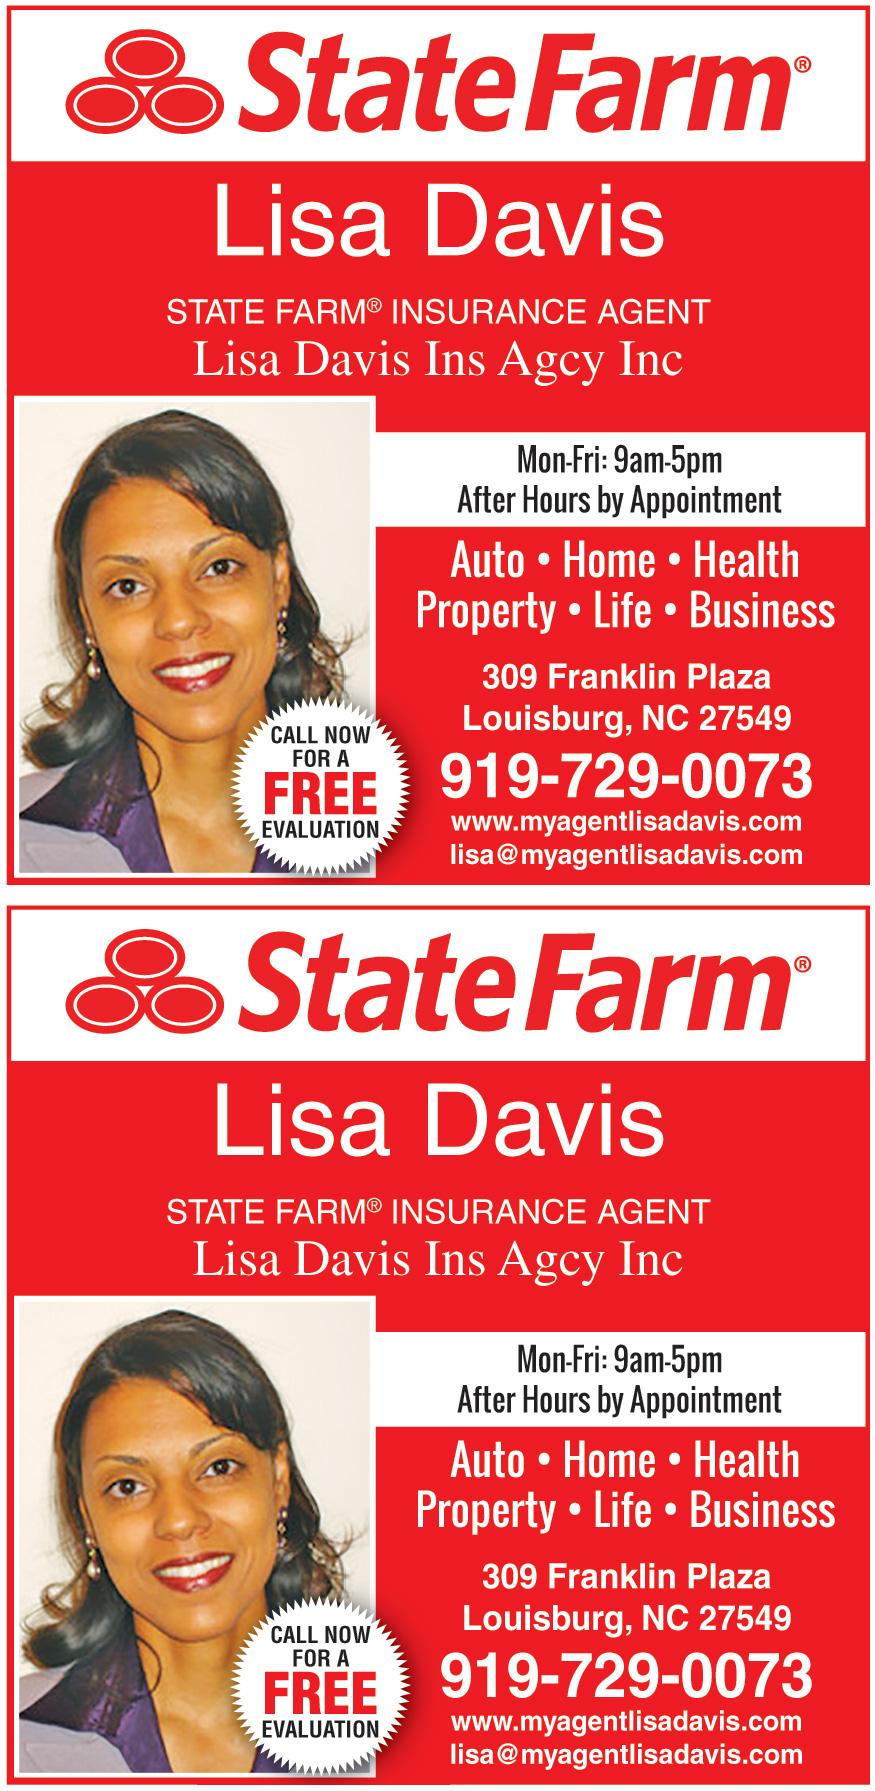 LISA DAVIS INSURANCE